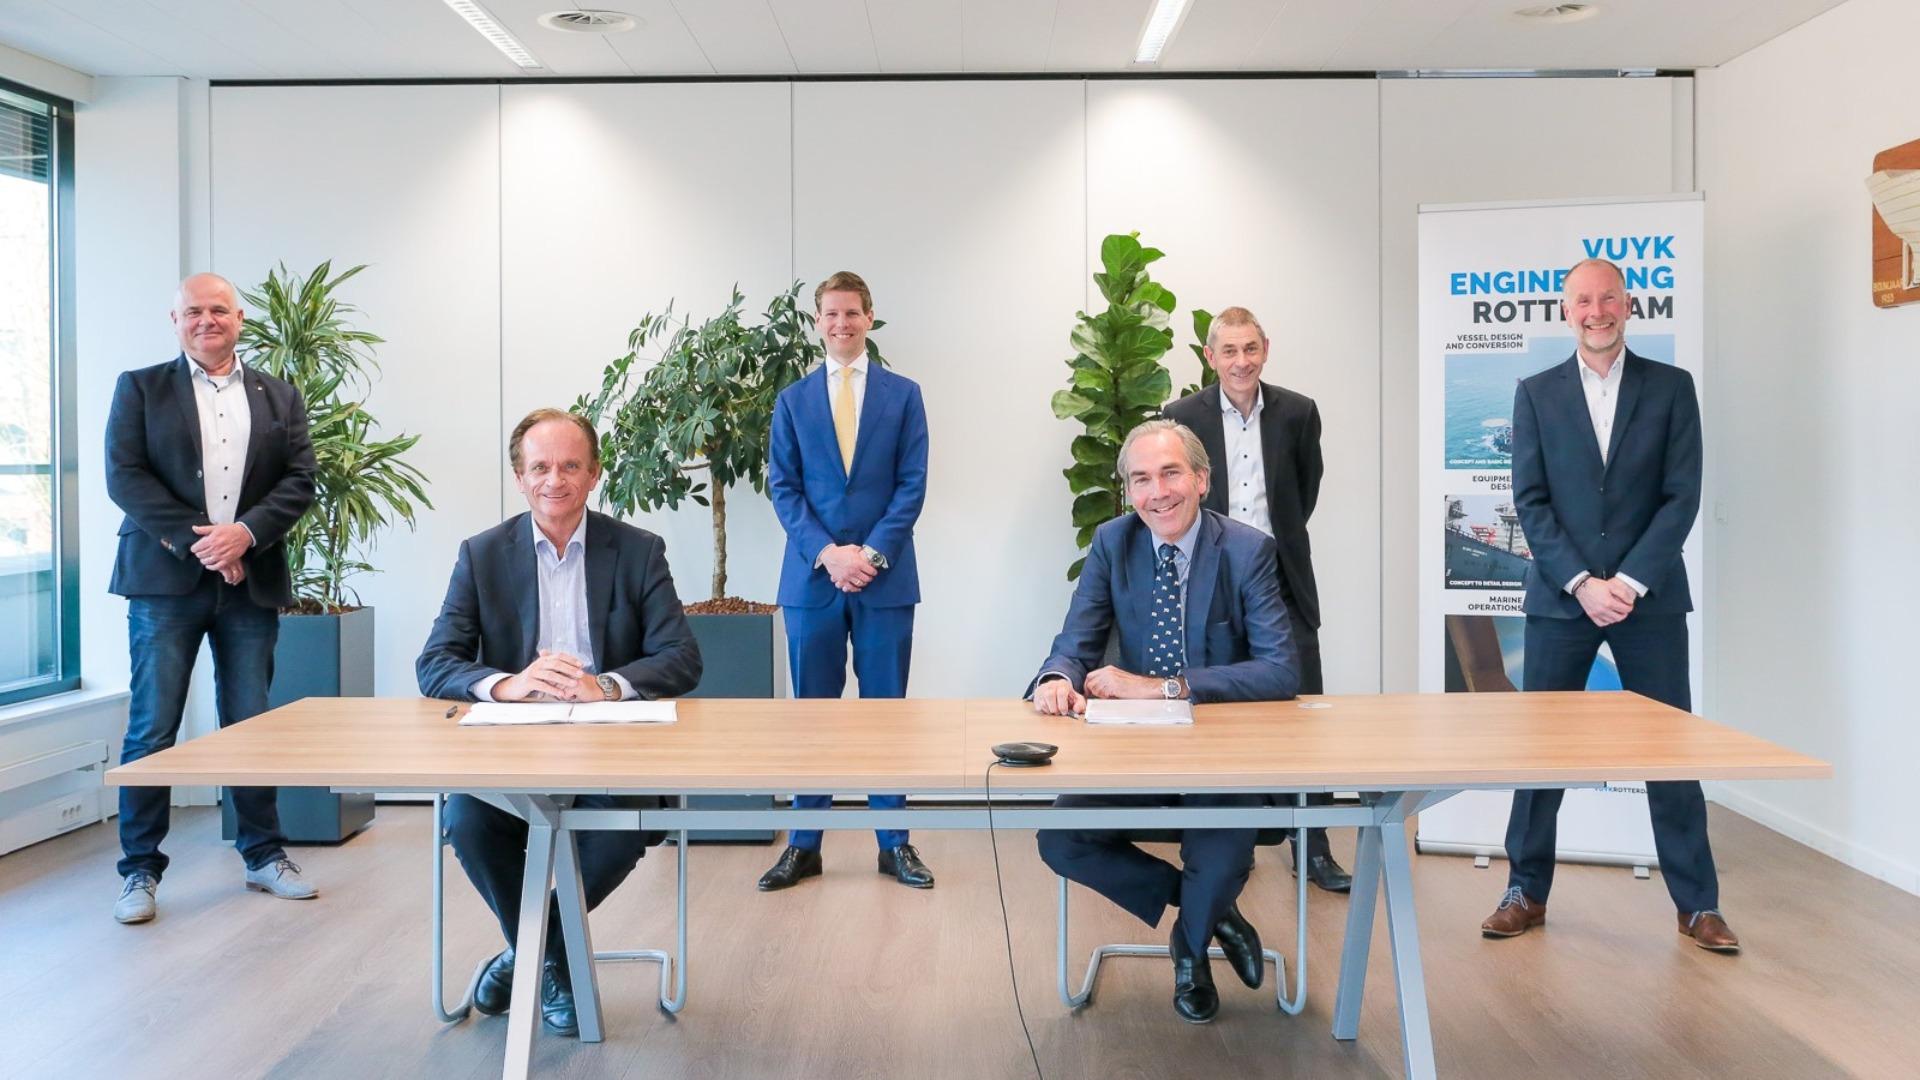 Image: Royal Doeksen took over Vuyk Engineering Rotterdam from royal IHC